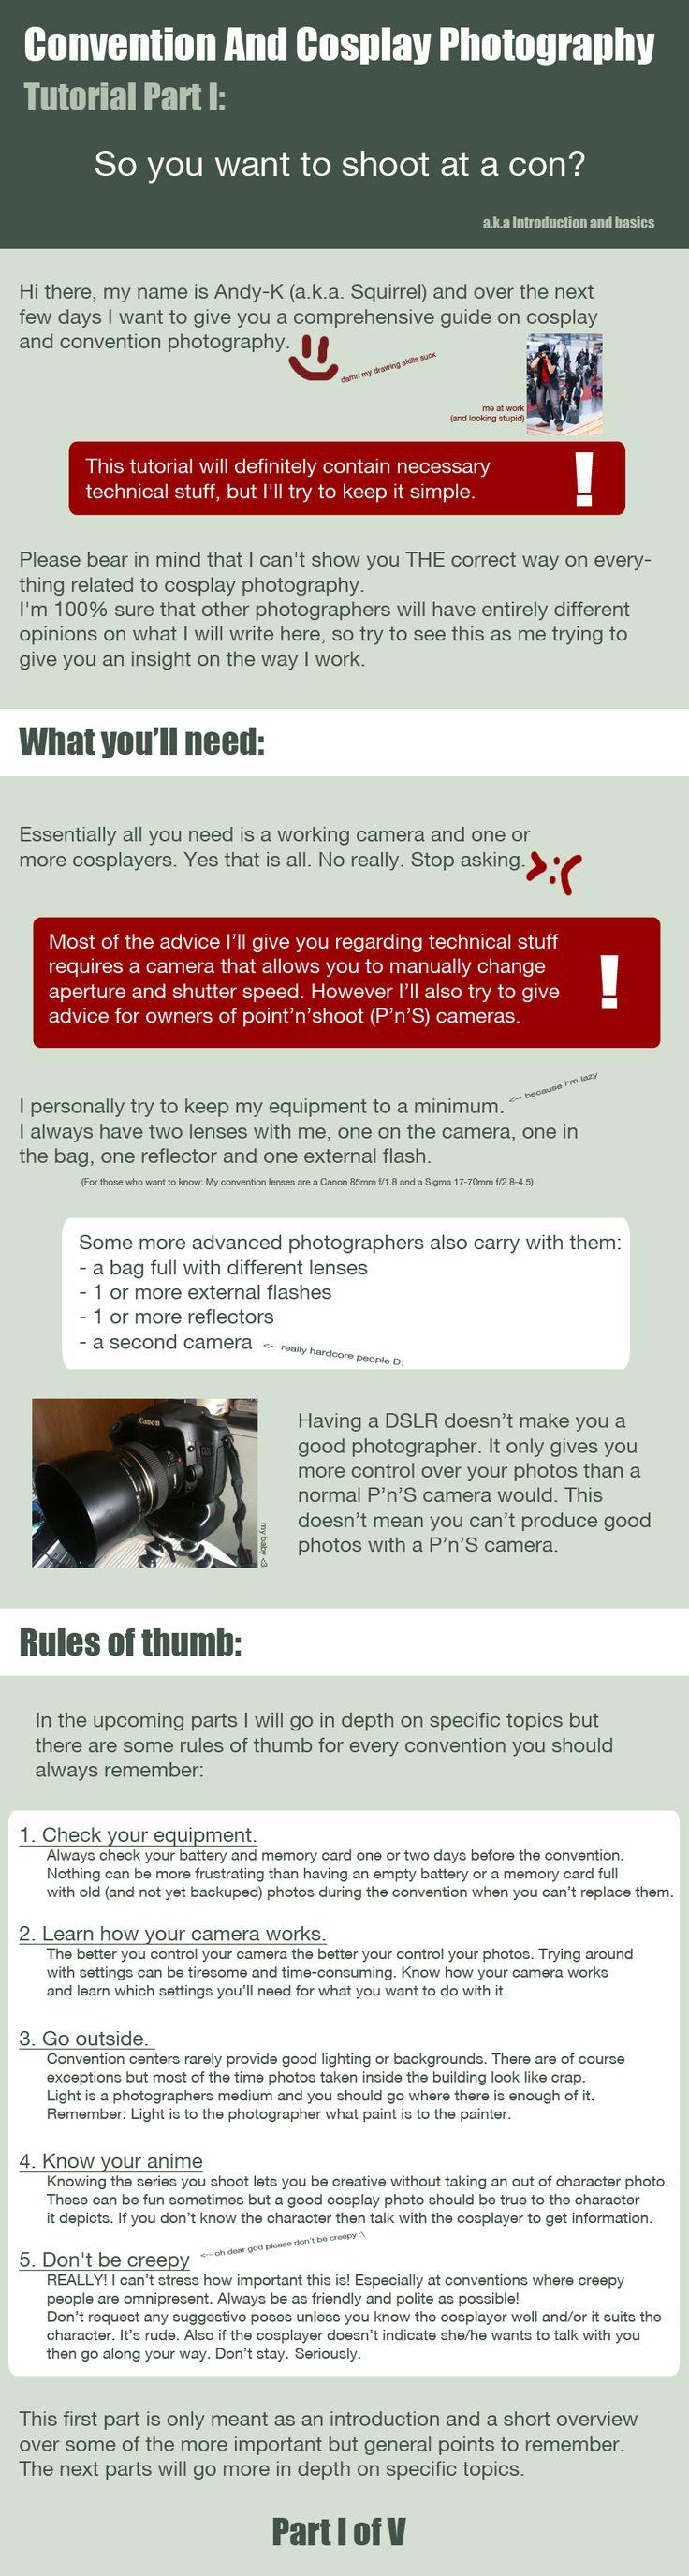 best hacks images on pinterest bricolage photography hacks